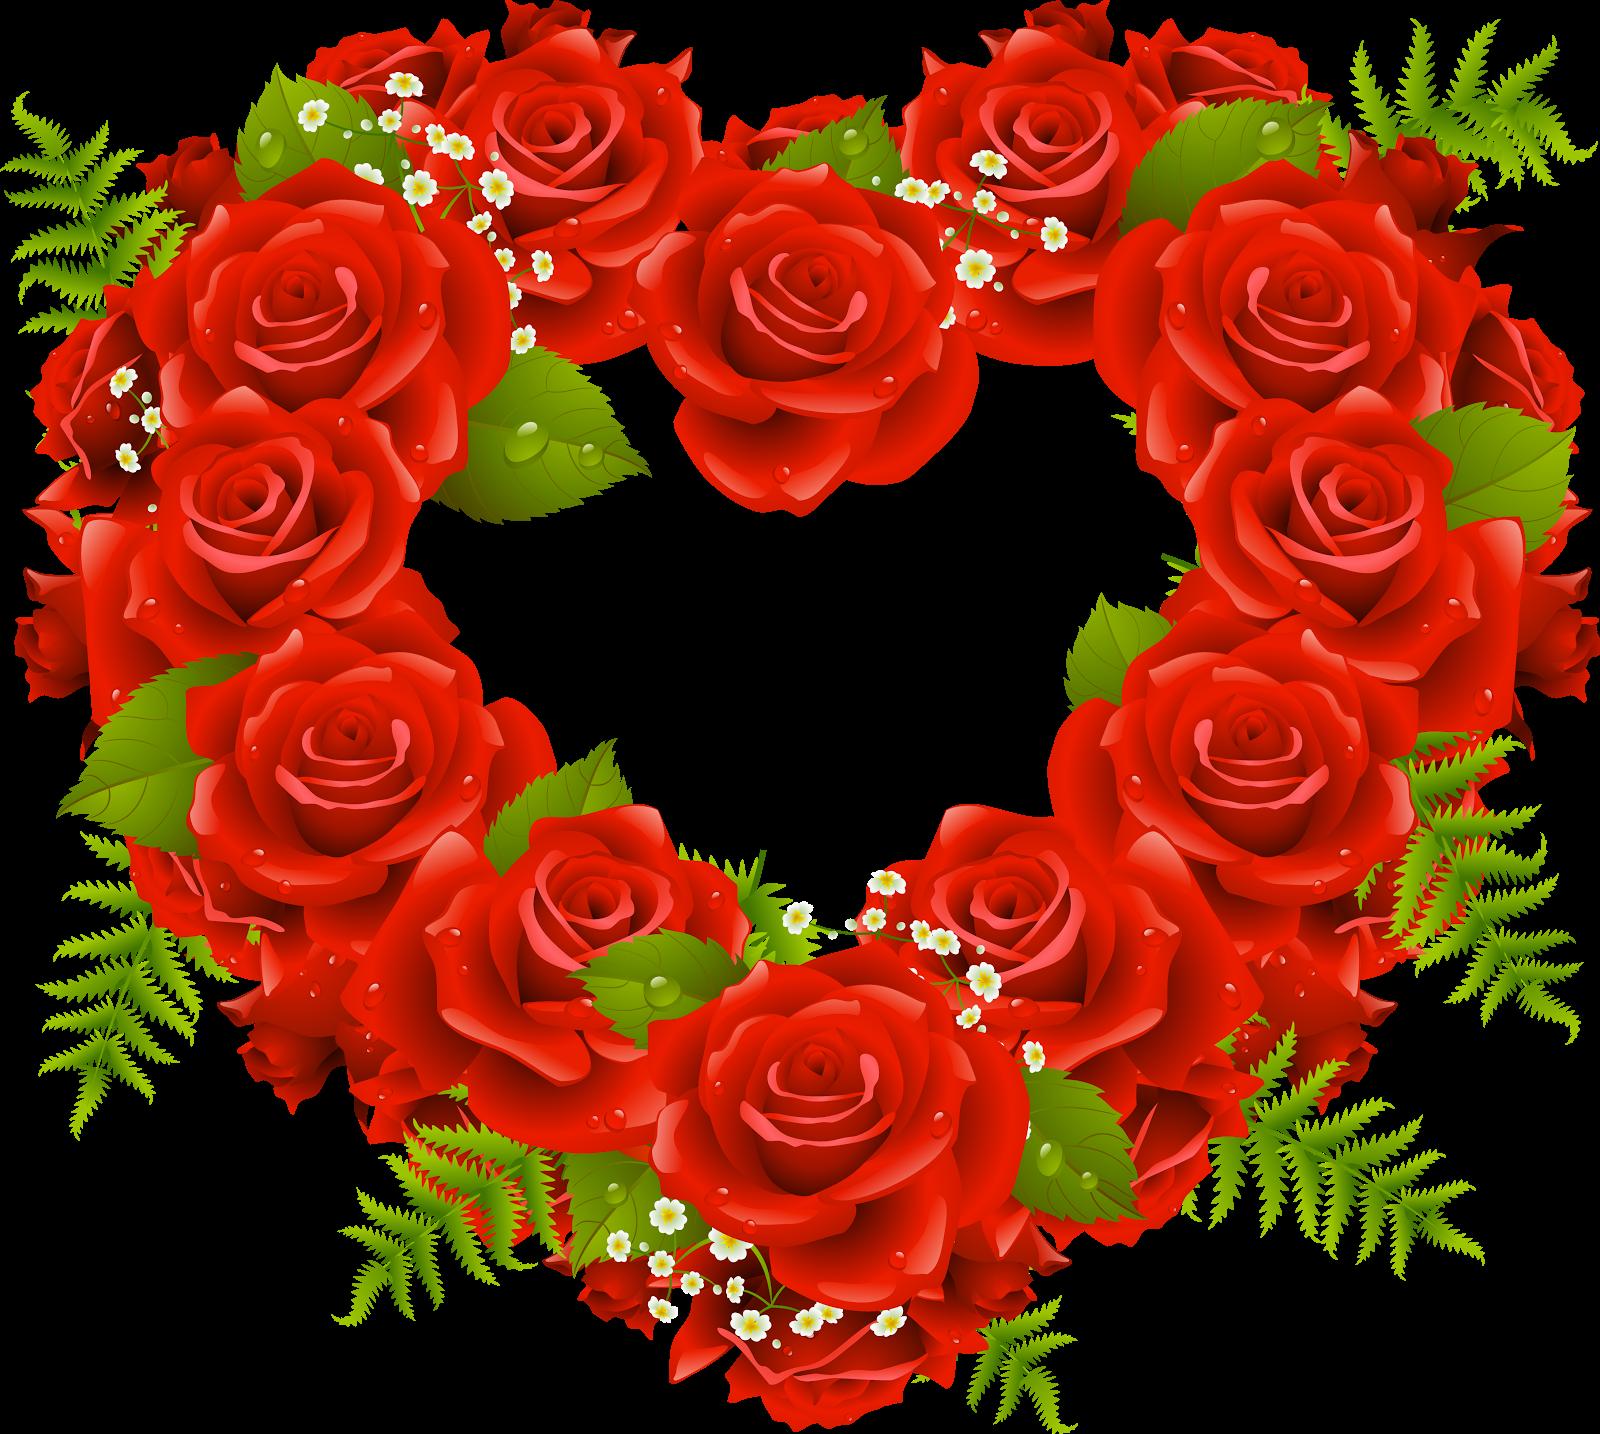 Clipart roses maroon. Rose heart desktop wallpaper